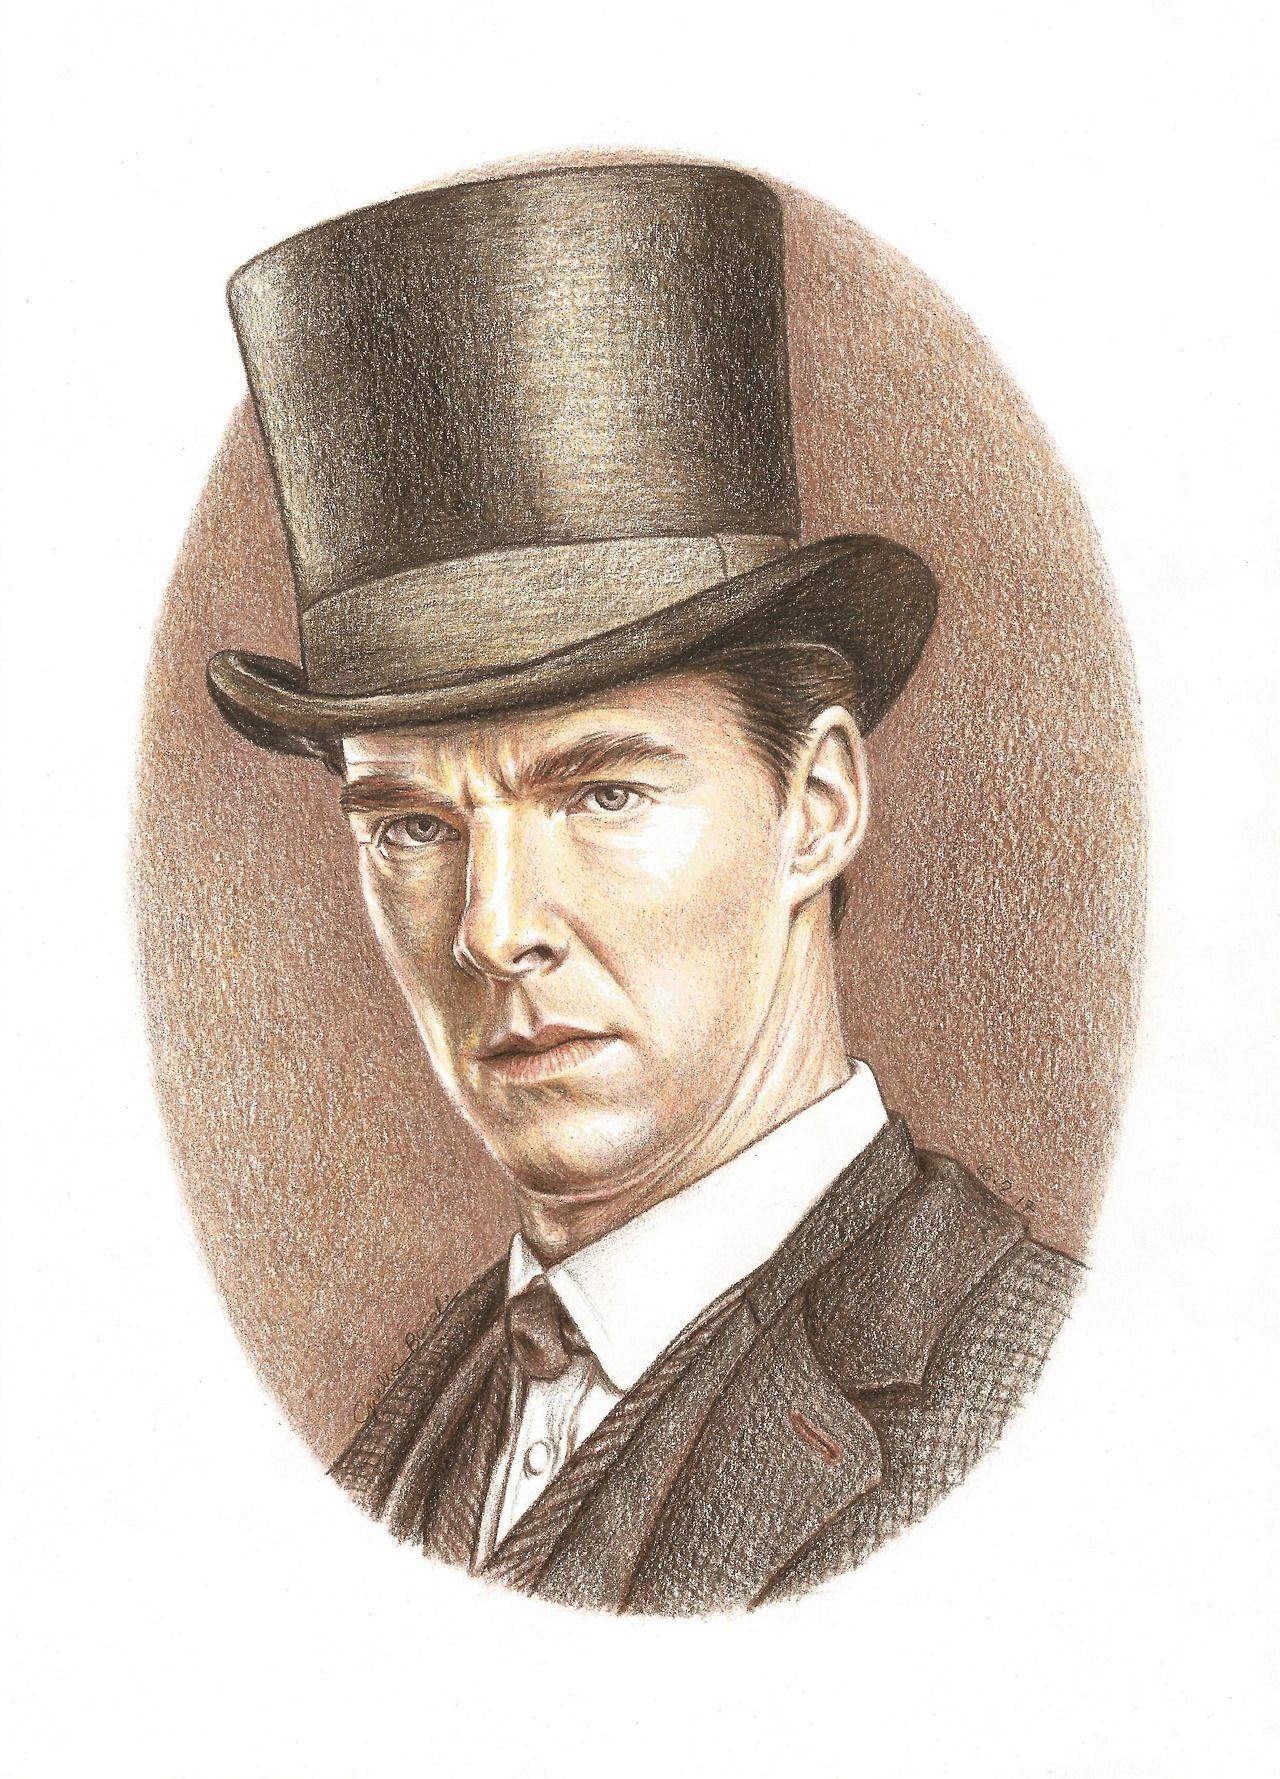 """E é sempre 1895"" Eu desenhei o Dr. Watson eo Sr. Holmes ao mesmo tempo, mudando de um para o outro (quase) cada vez que eu mudei de cor.  Todos os tipos de marrom estavam envolvidos.  Dr. John Watson: [x]"